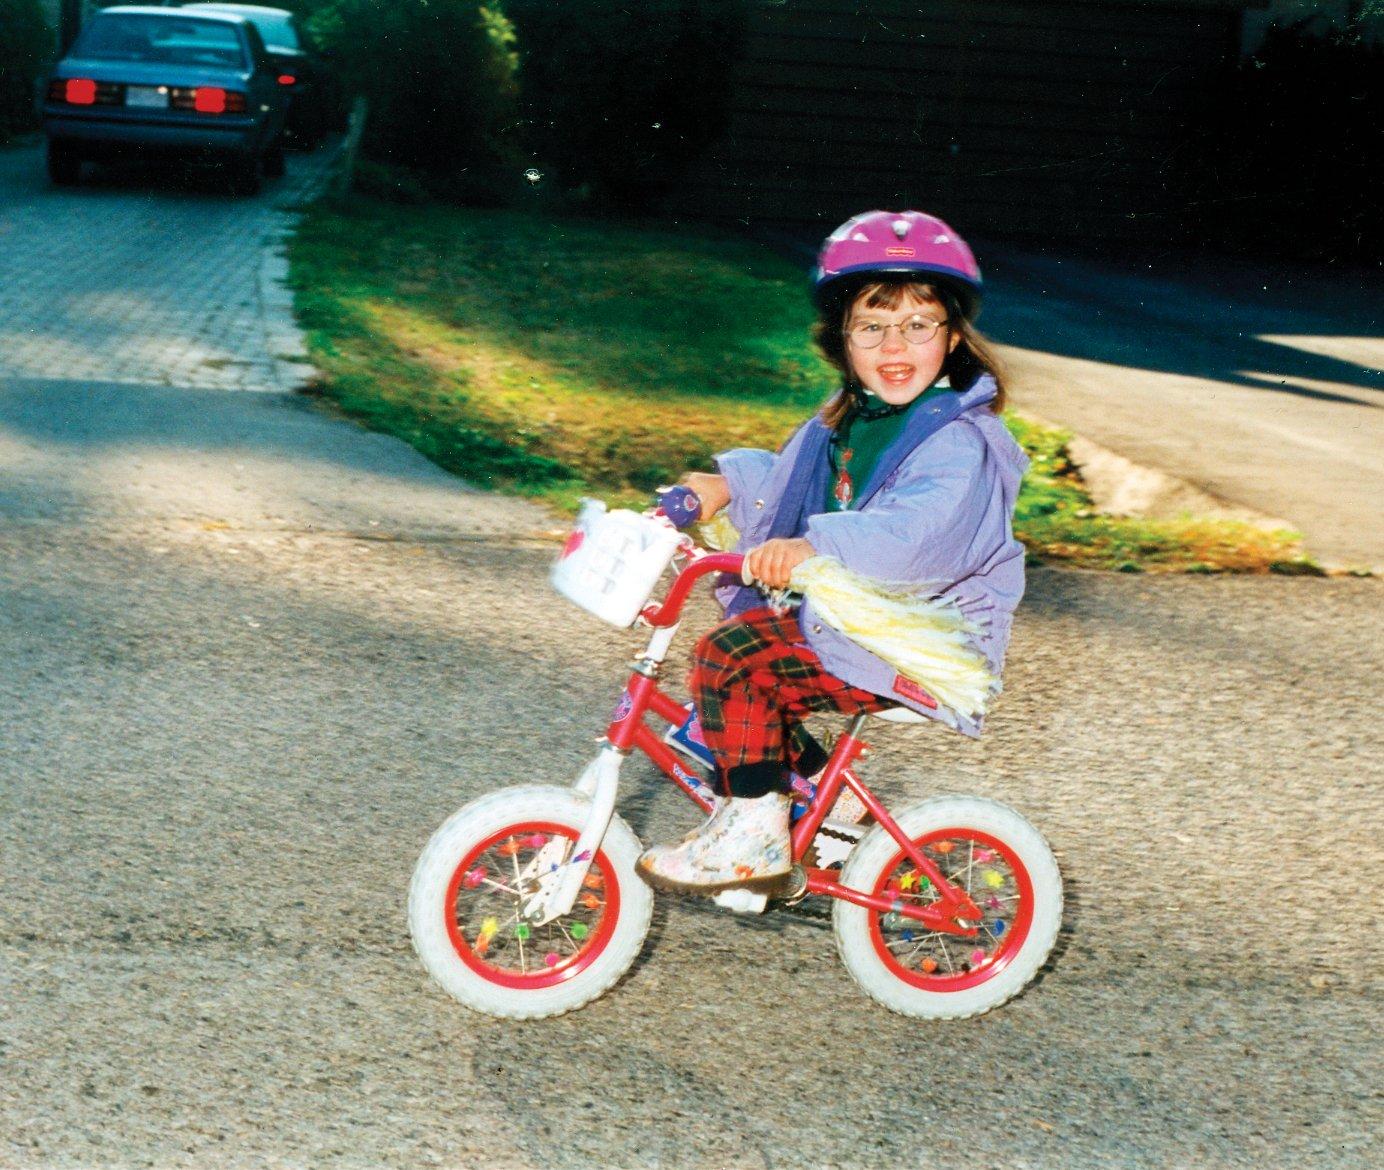 Molly Burke Kid On Bike April 13 p168